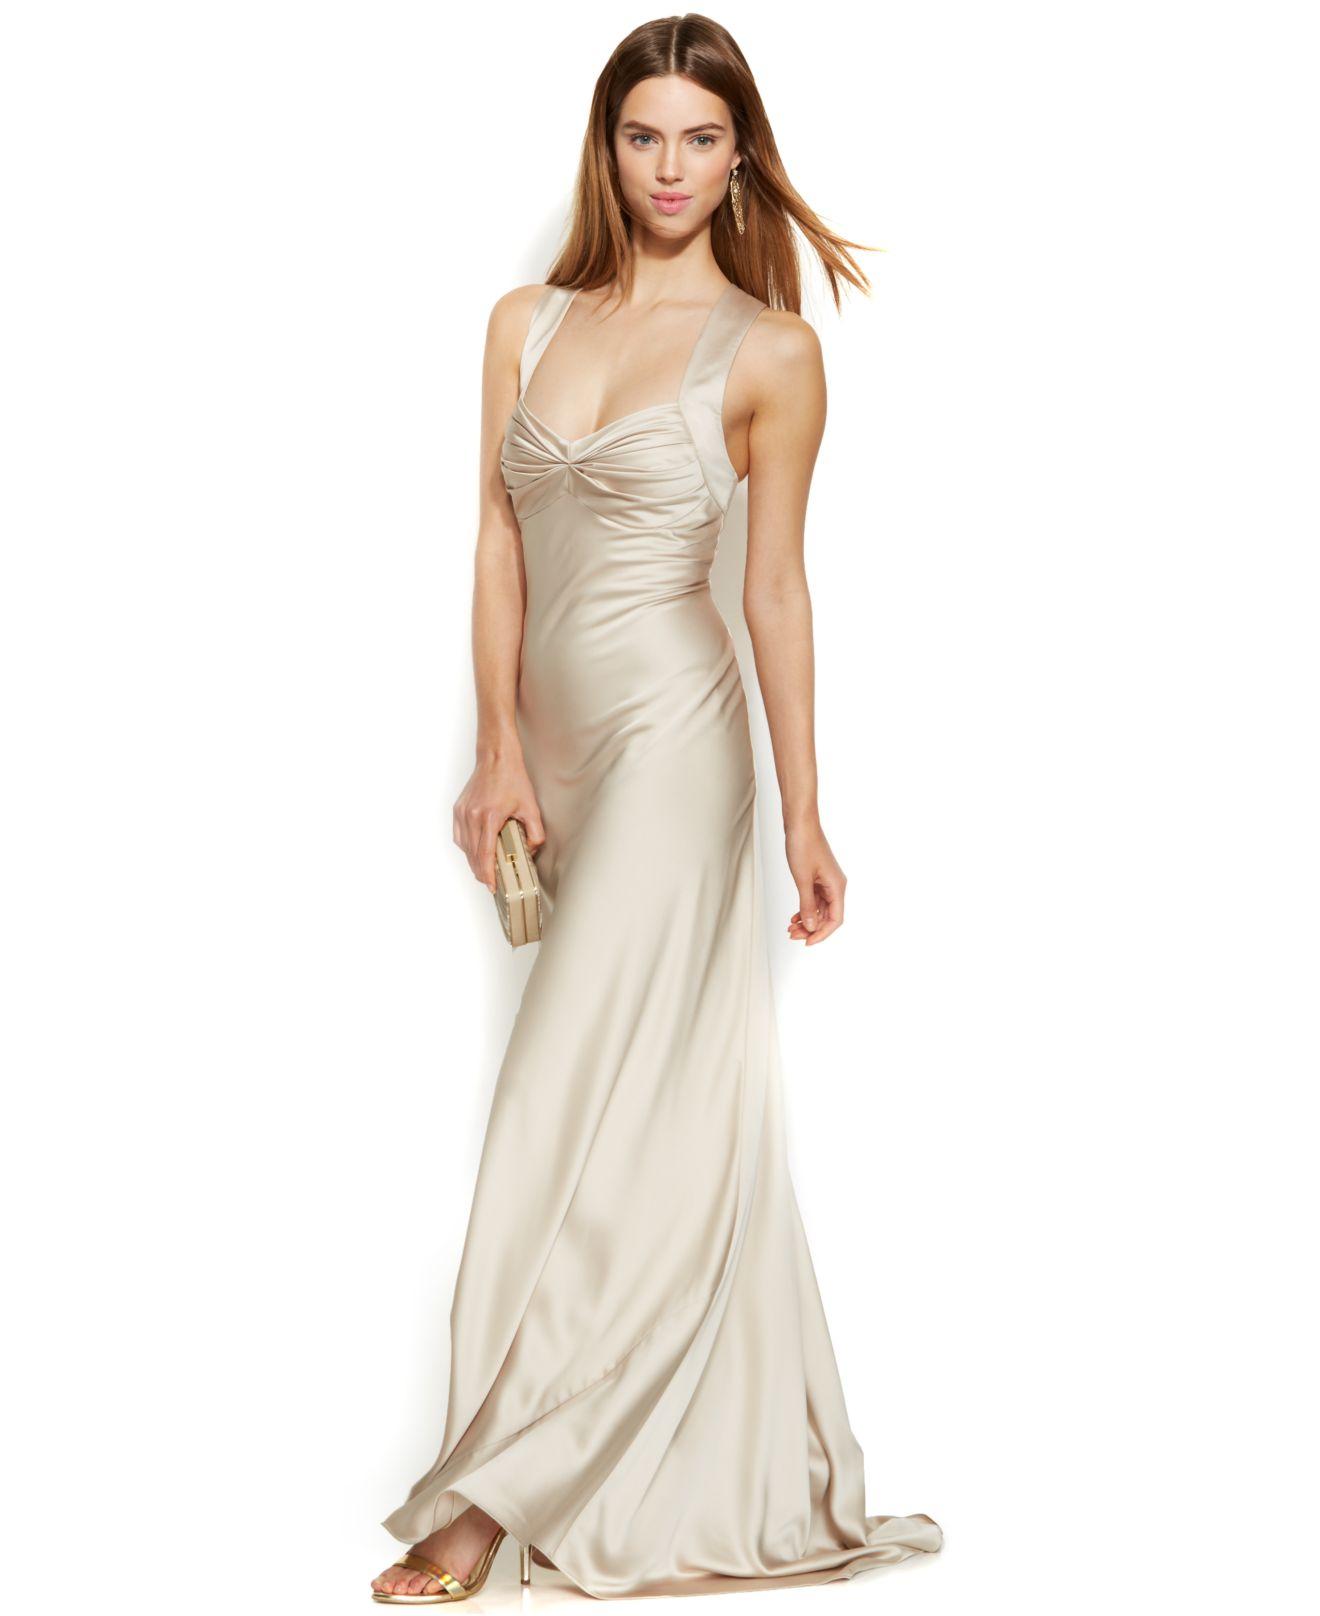 bac91289 Calvin Klein Sleeveless Satin Sweetheart Gown in Metallic - Lyst